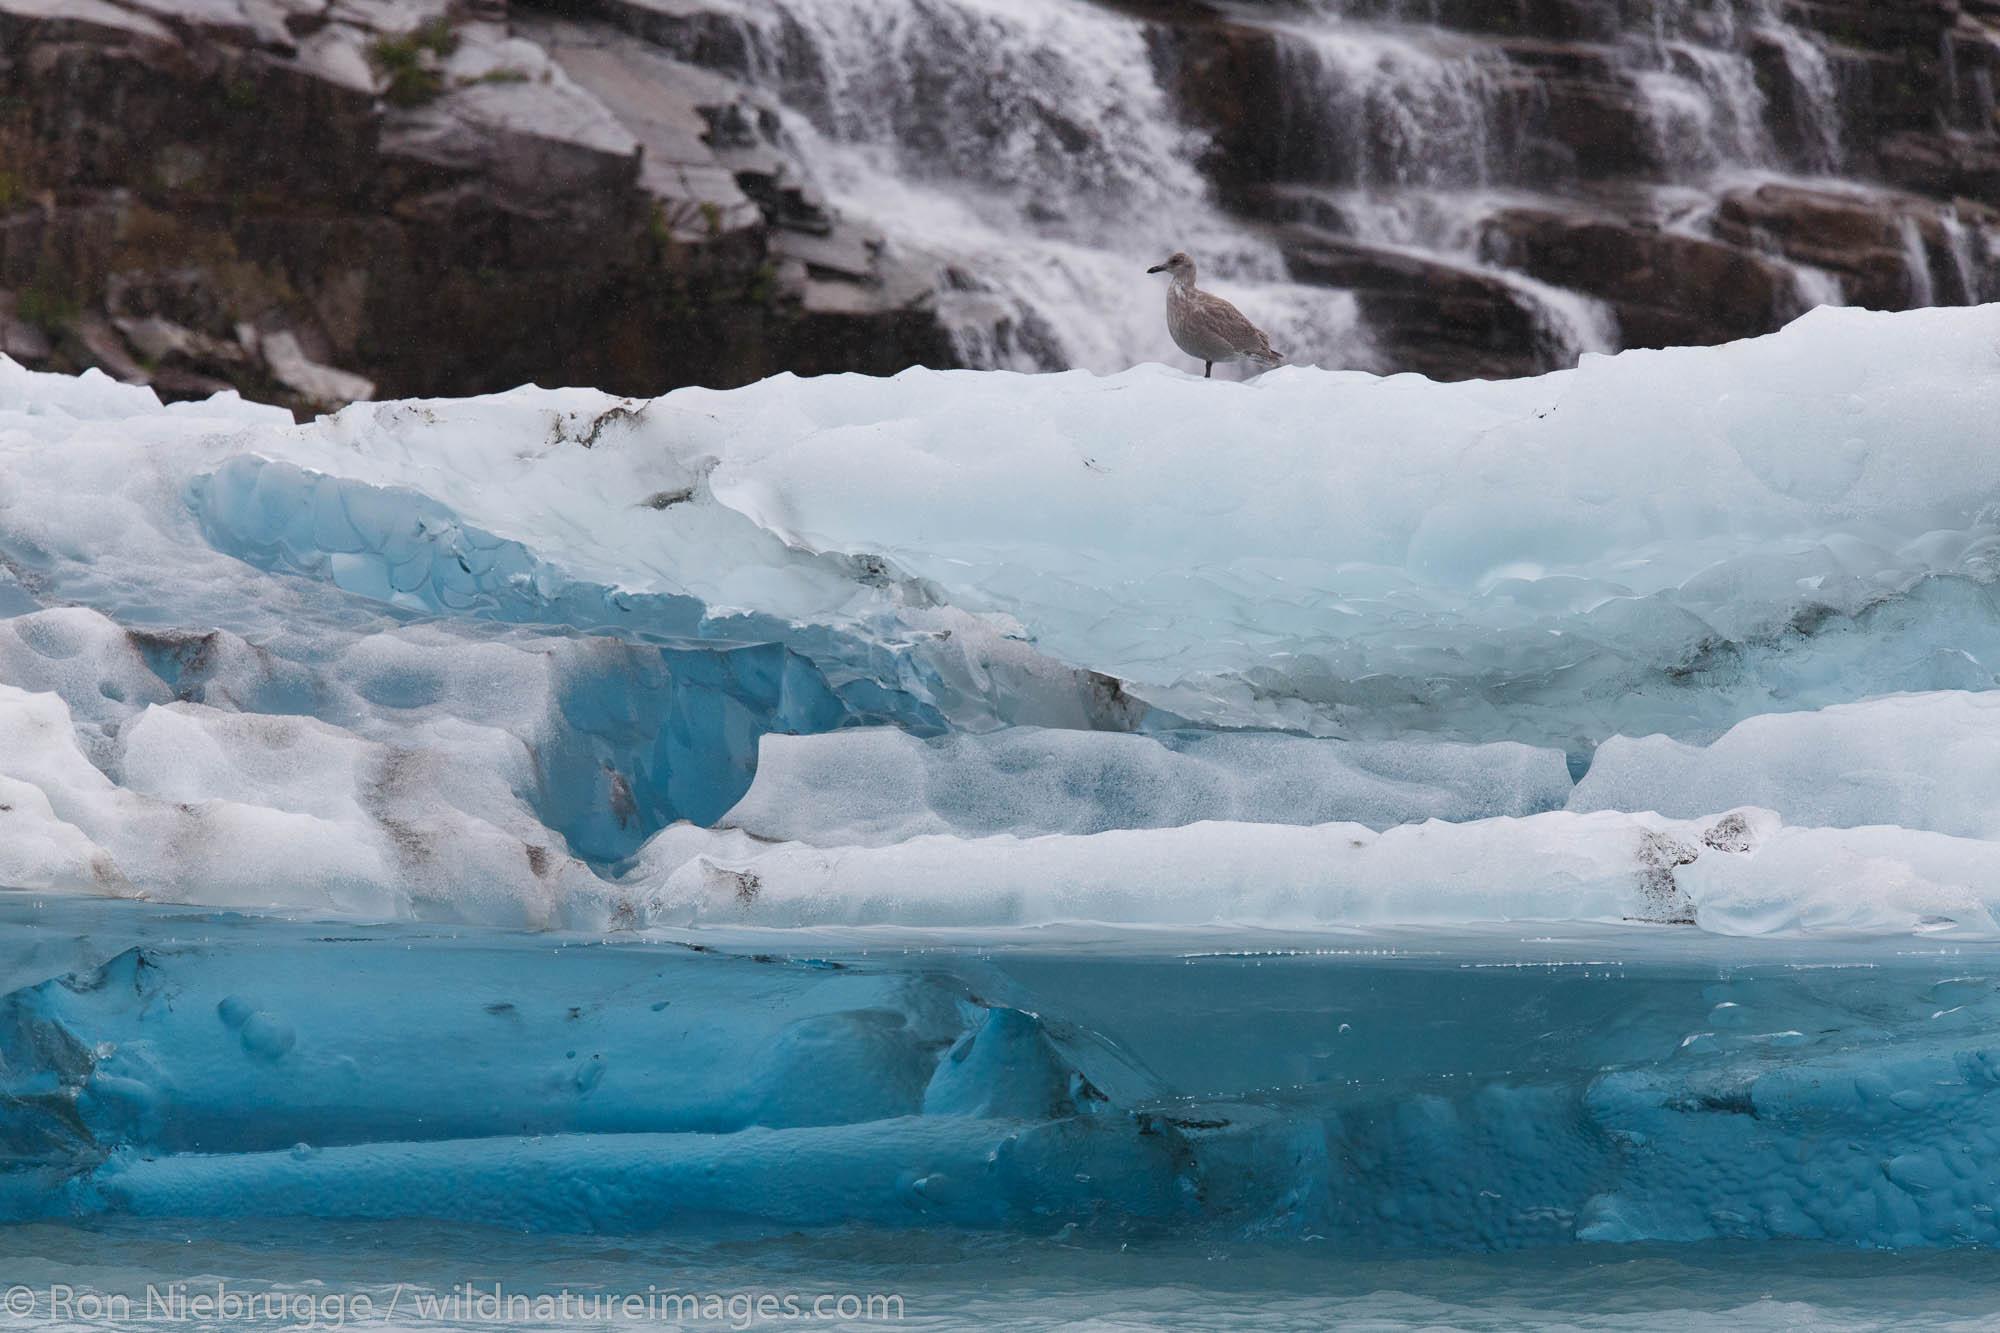 Gull on iceberg in Prince William Sound, Chugach National Forest, Alaska.